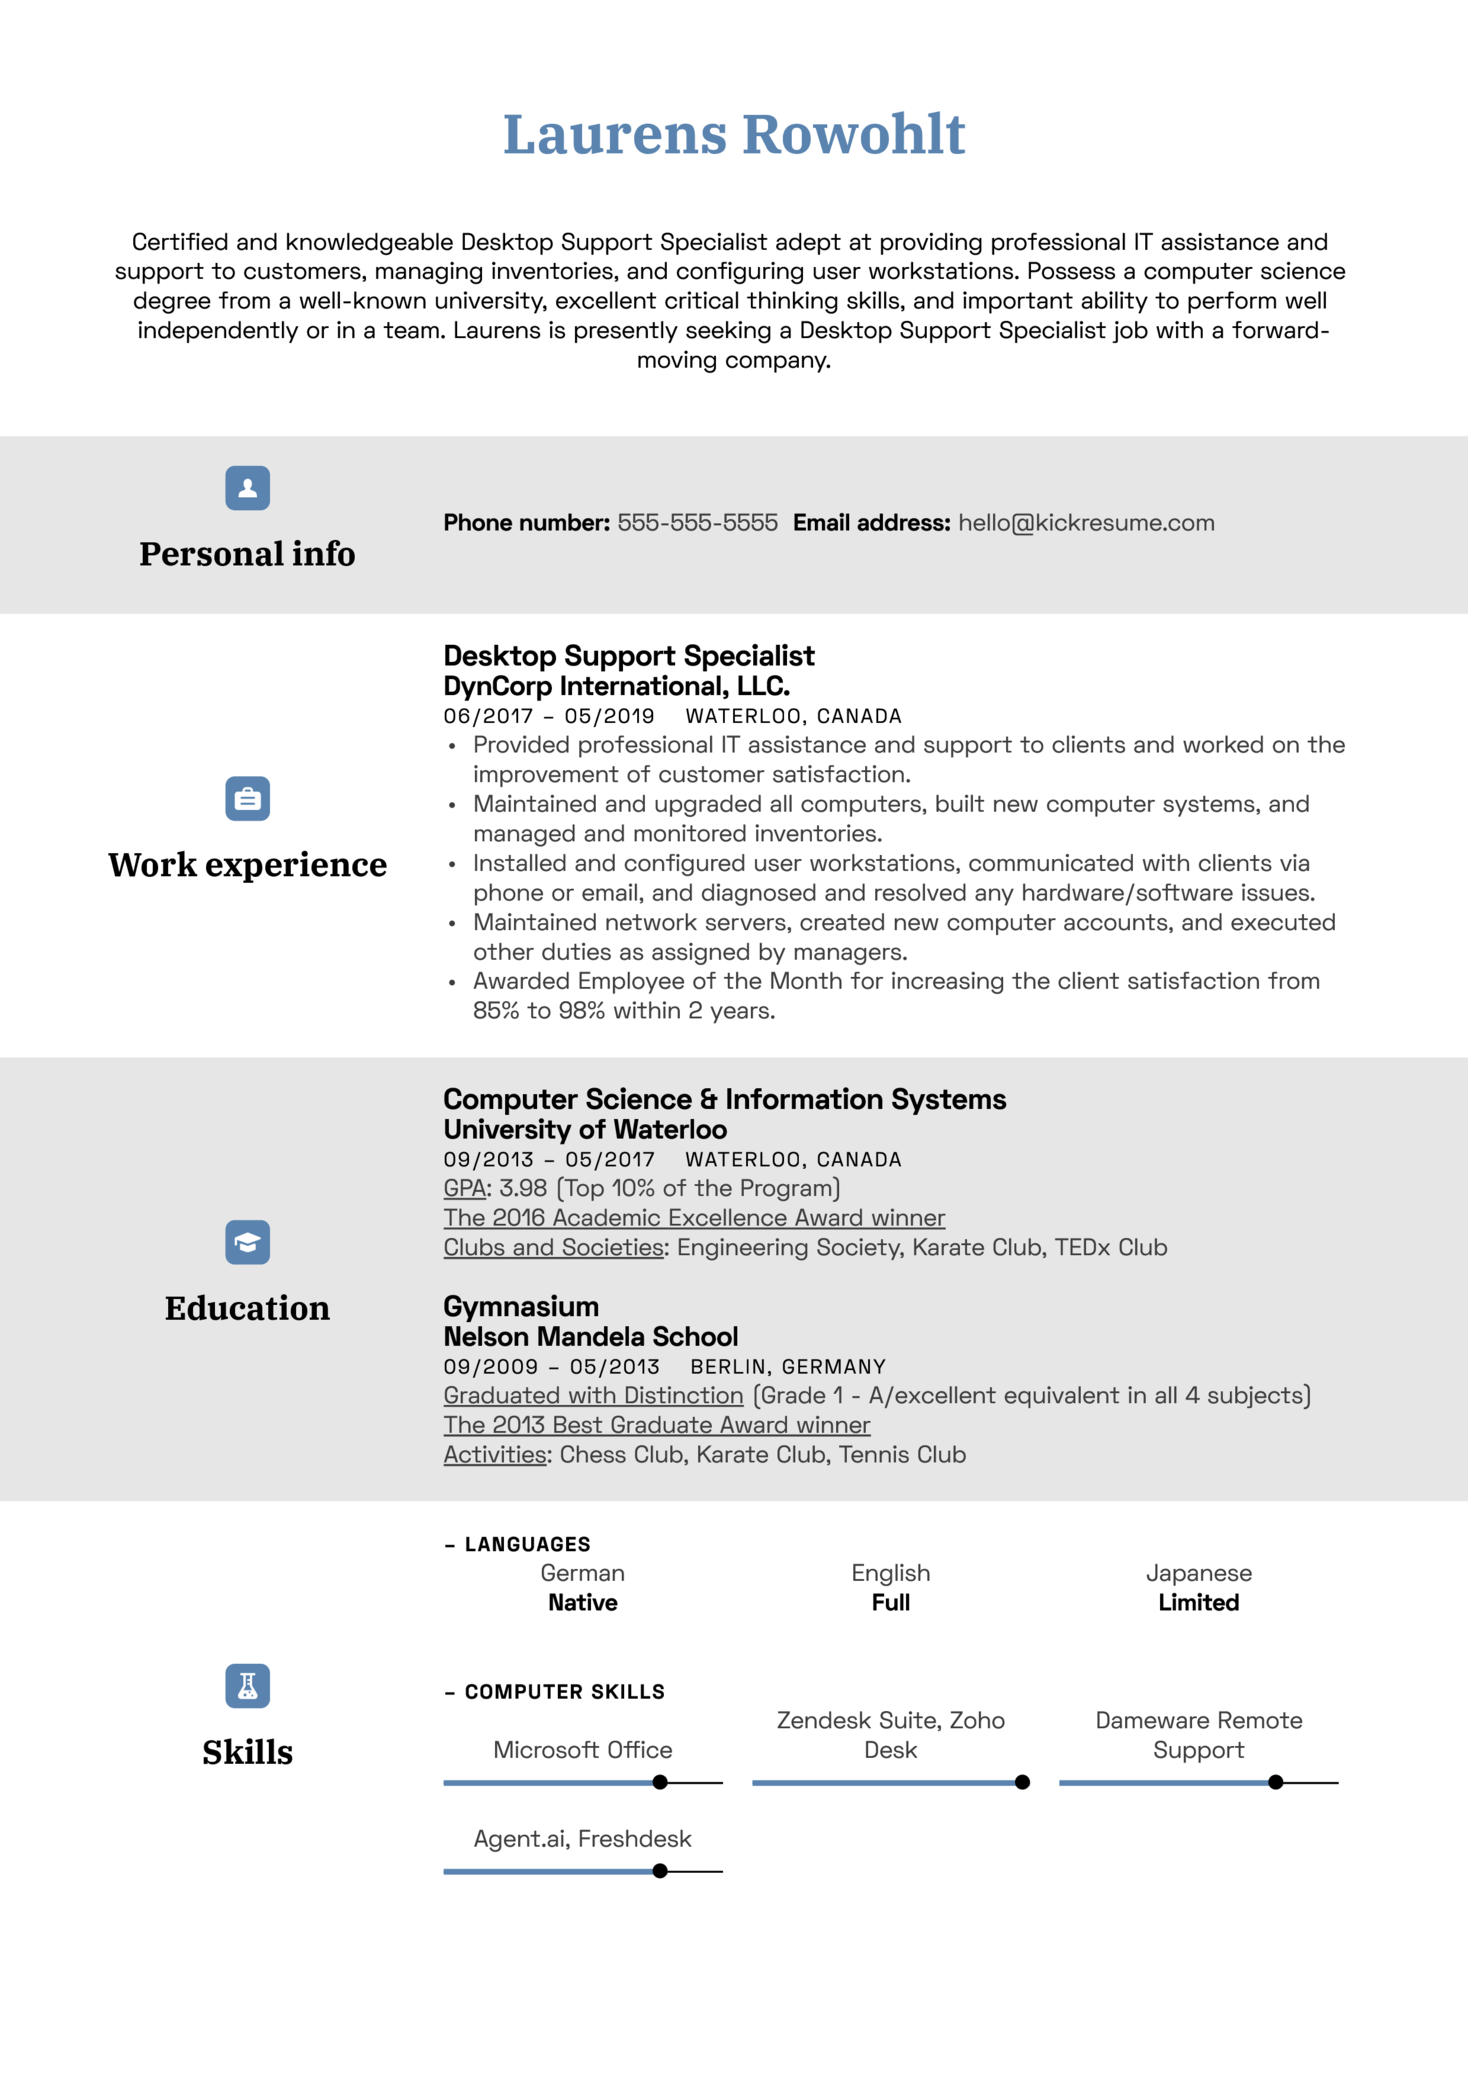 Desktop Support Specialist Resume Sample (Part 1)